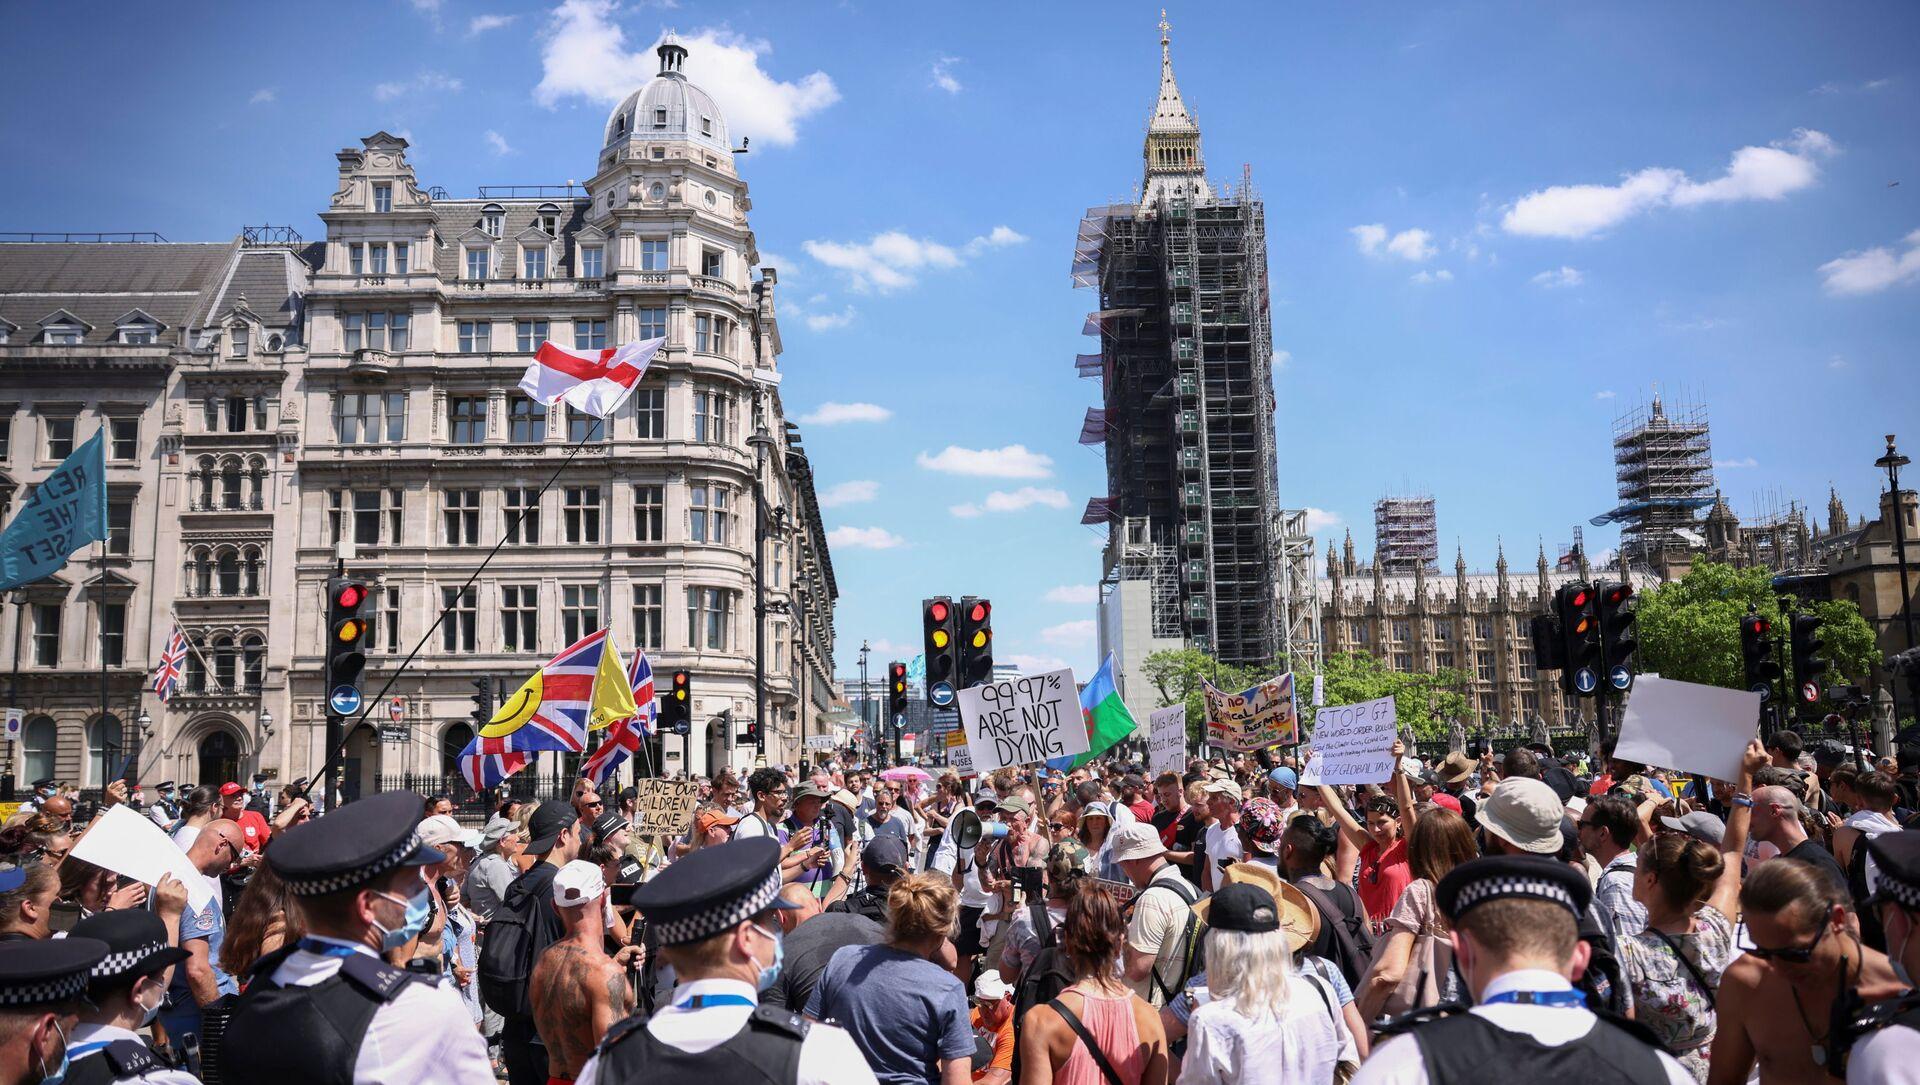 Protest against COVID-19 lockdown in London - Sputnik International, 1920, 14.06.2021